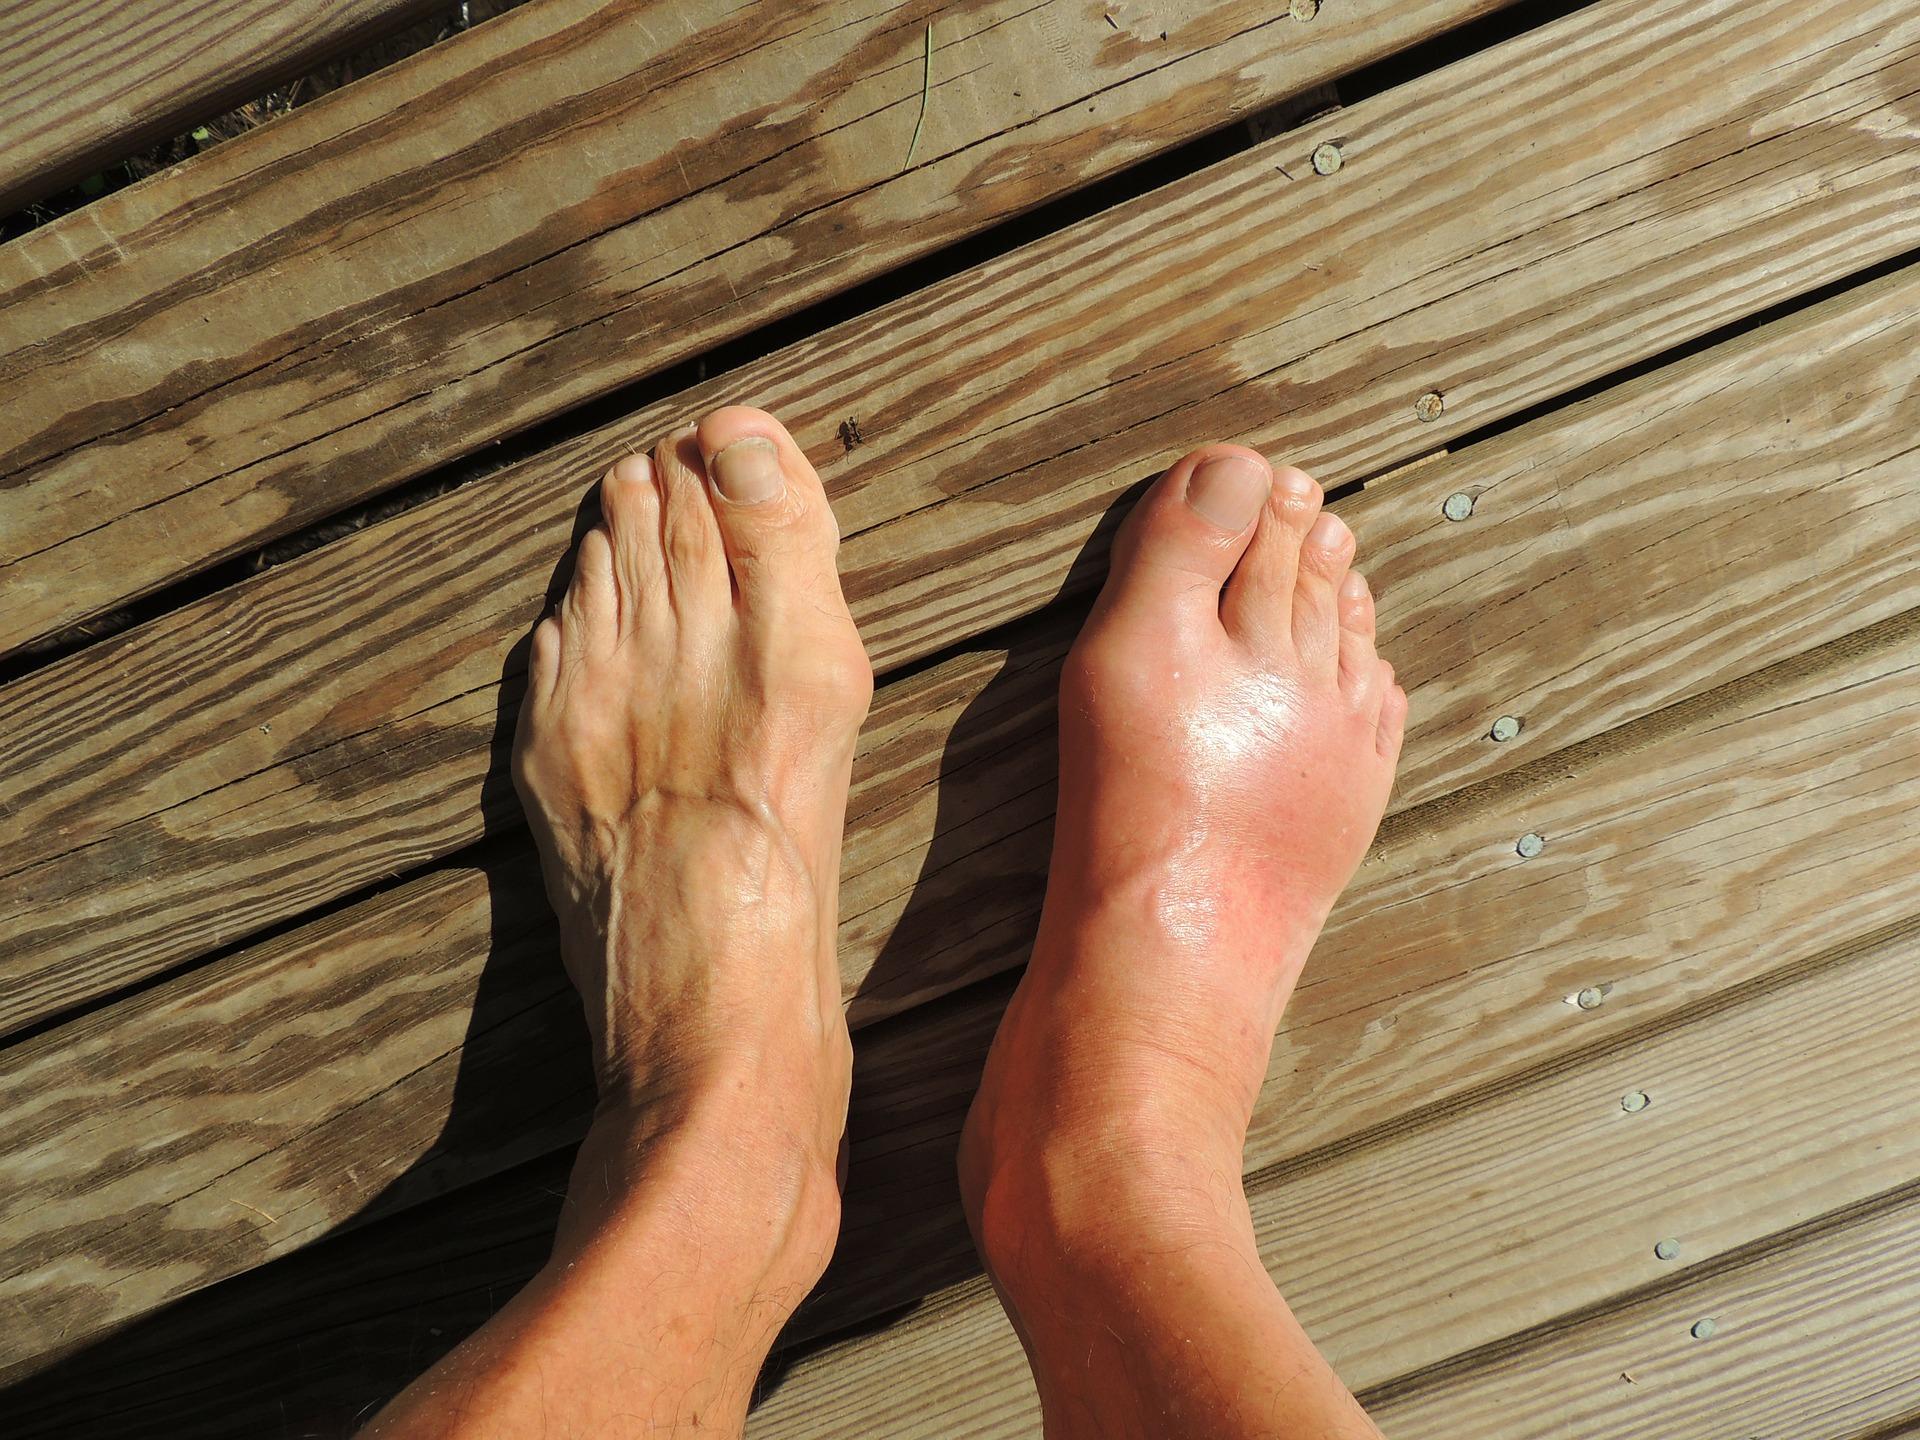 feet 174216 1920 - Gout